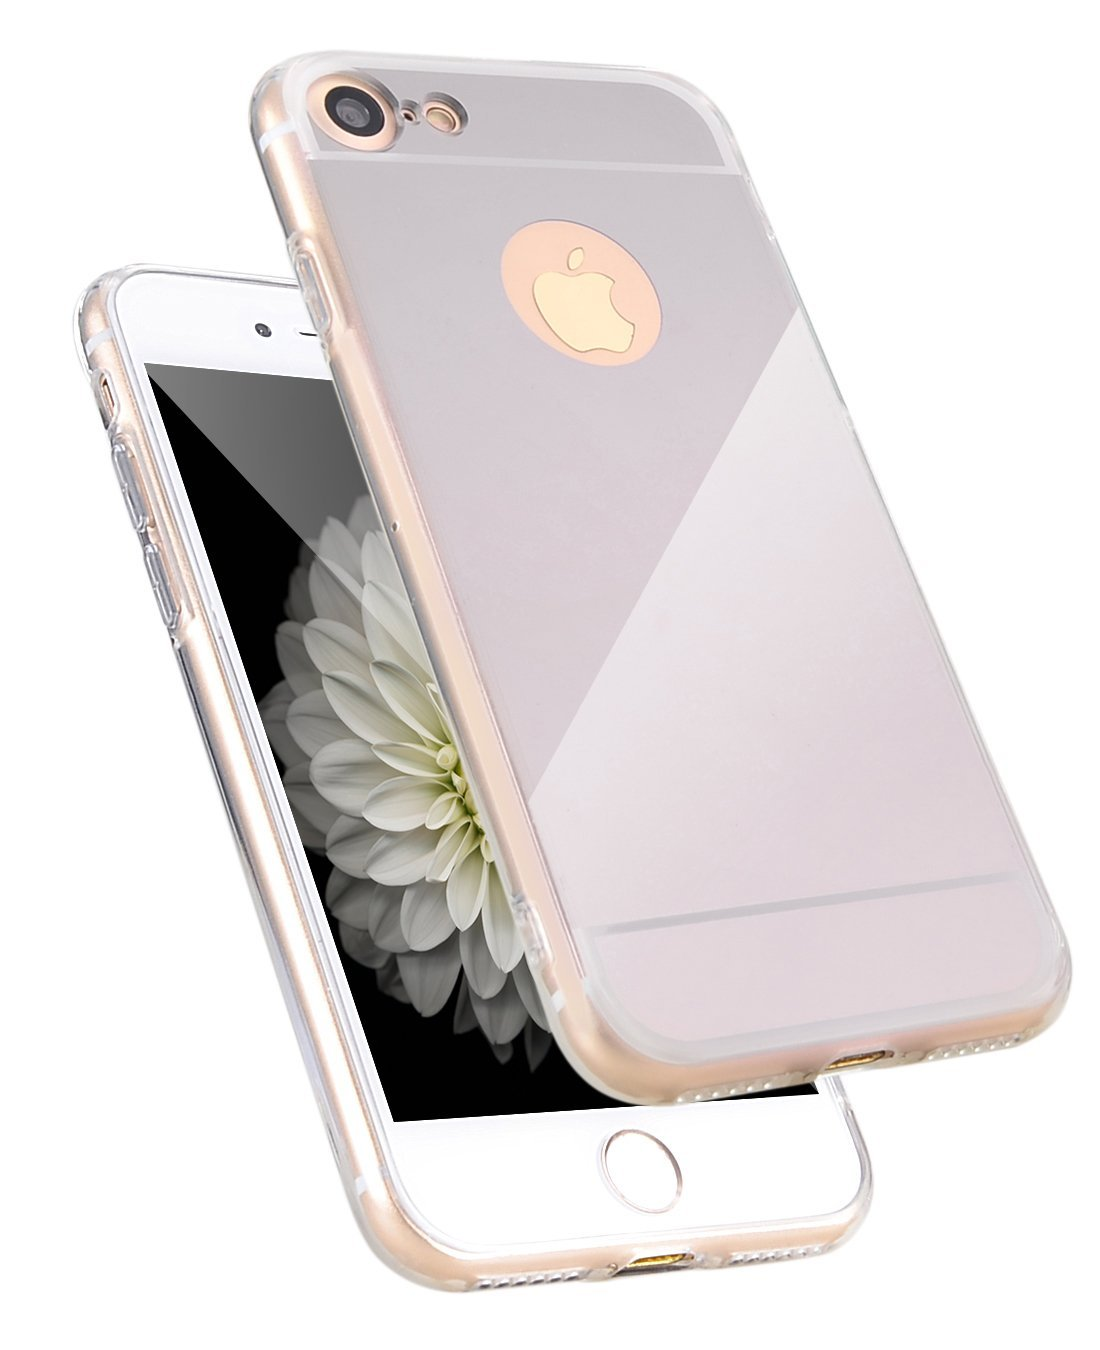 Zrcadlový kryt My Mirror pro iPhone 7 - Stříbrný (silver)